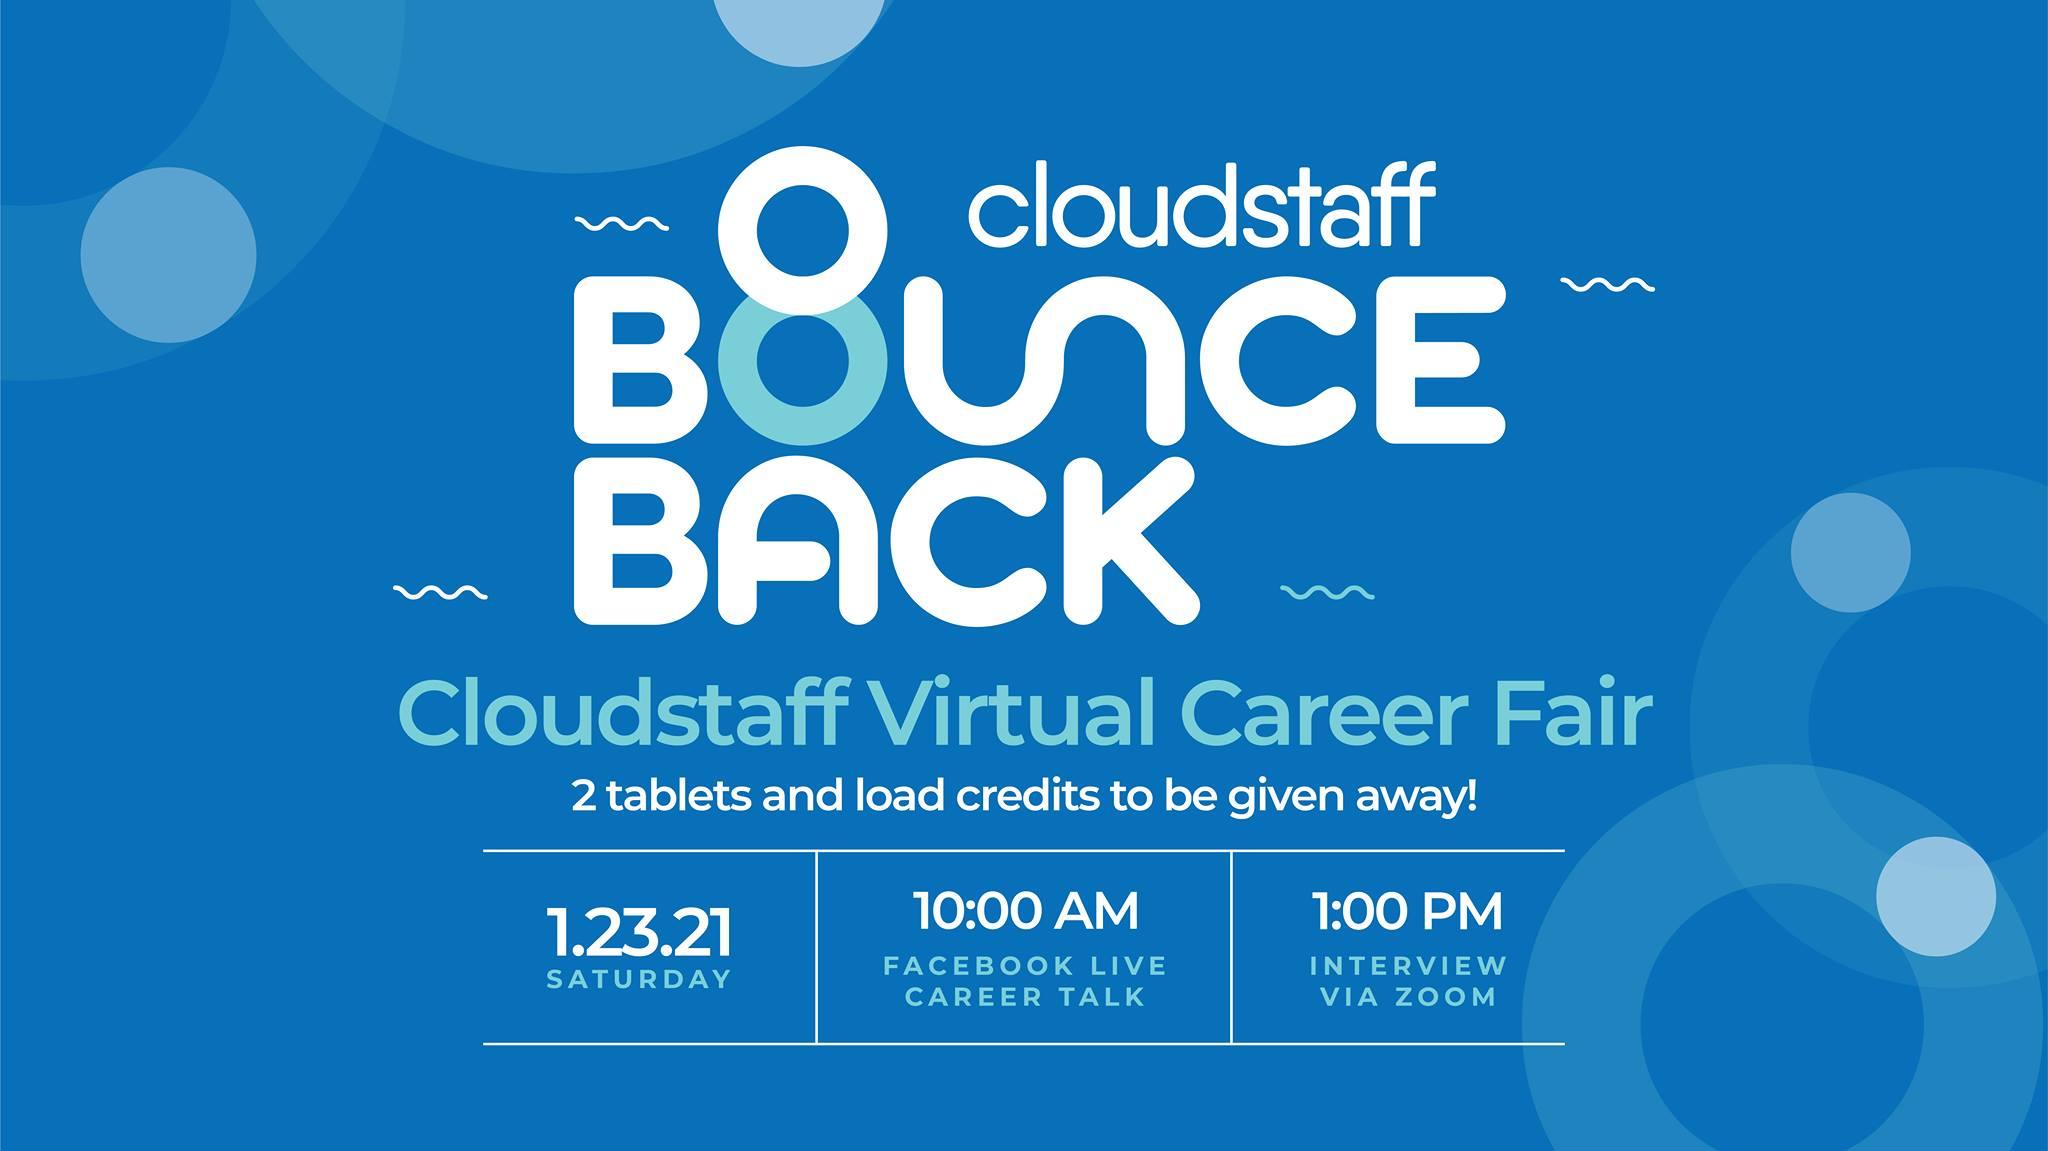 Cloudstaff to hold 'Bounce Back Virtual Career Fair'